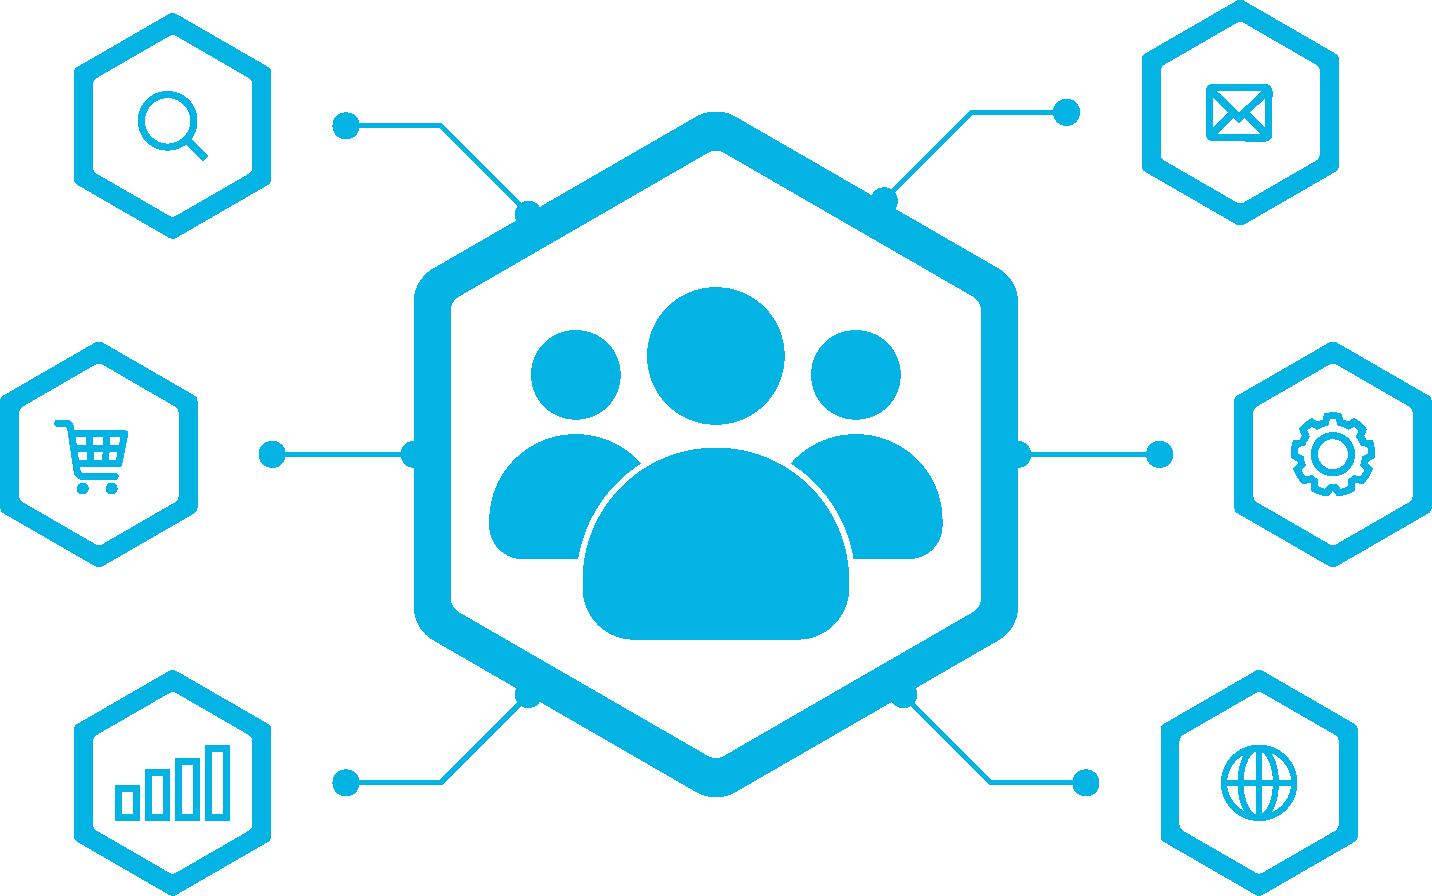 Blue icons representing Kochava Link offerings.